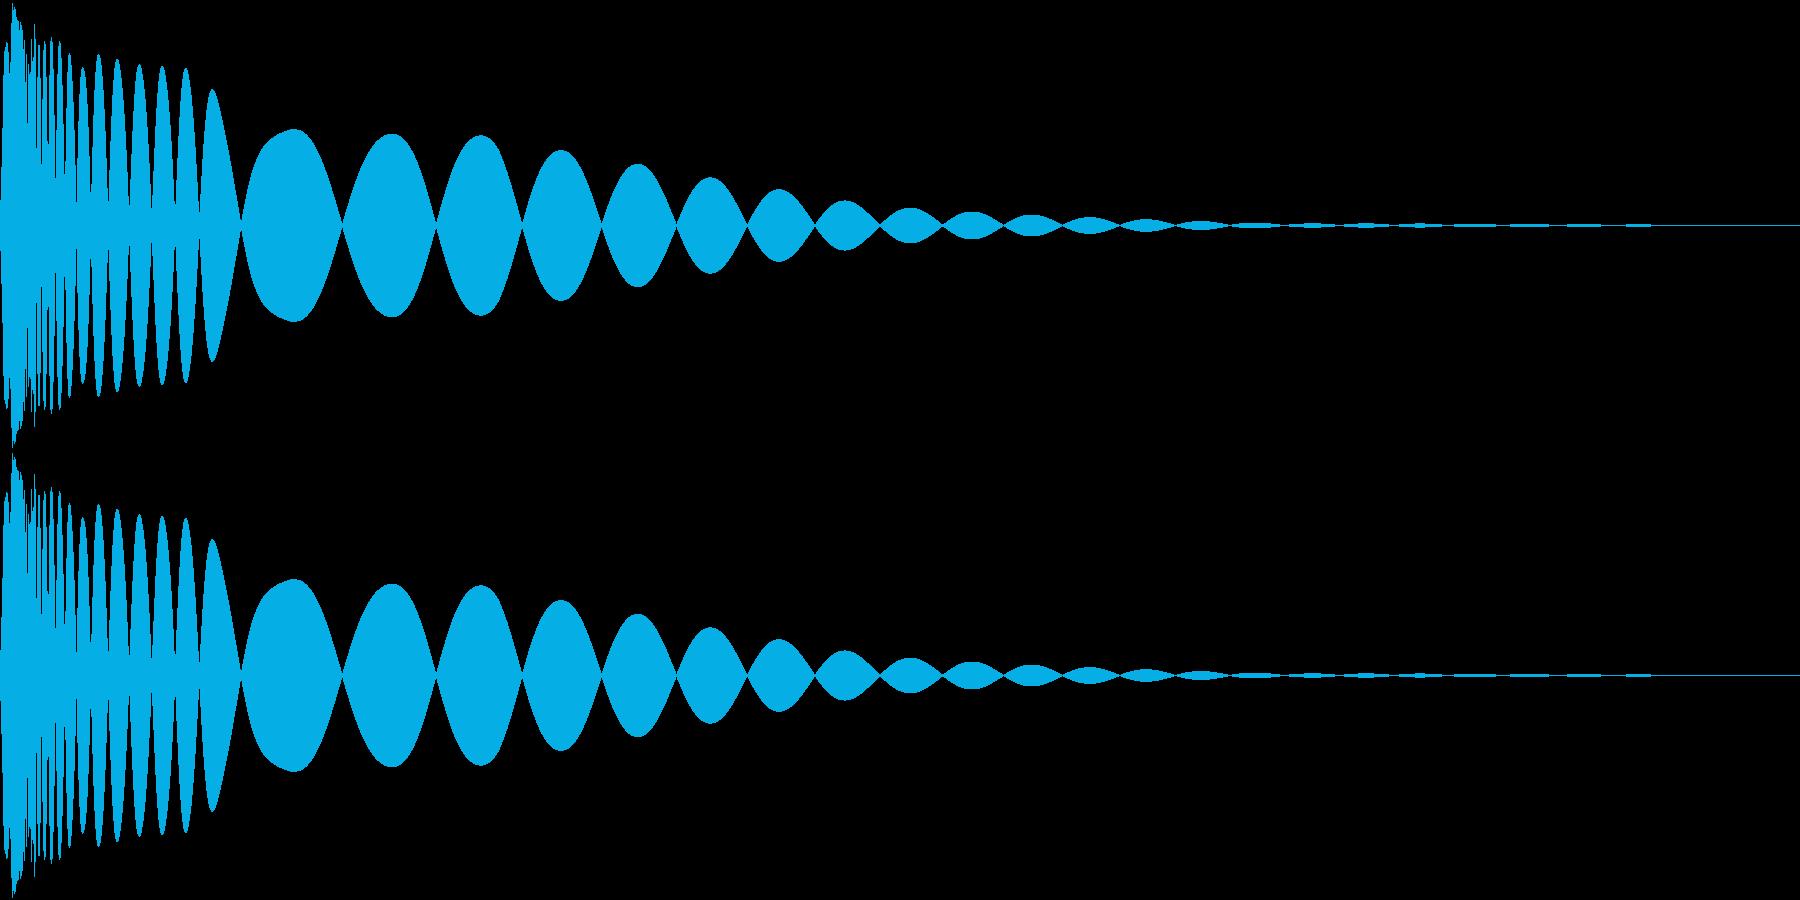 DTM Kick 67 オリジナル音源の再生済みの波形